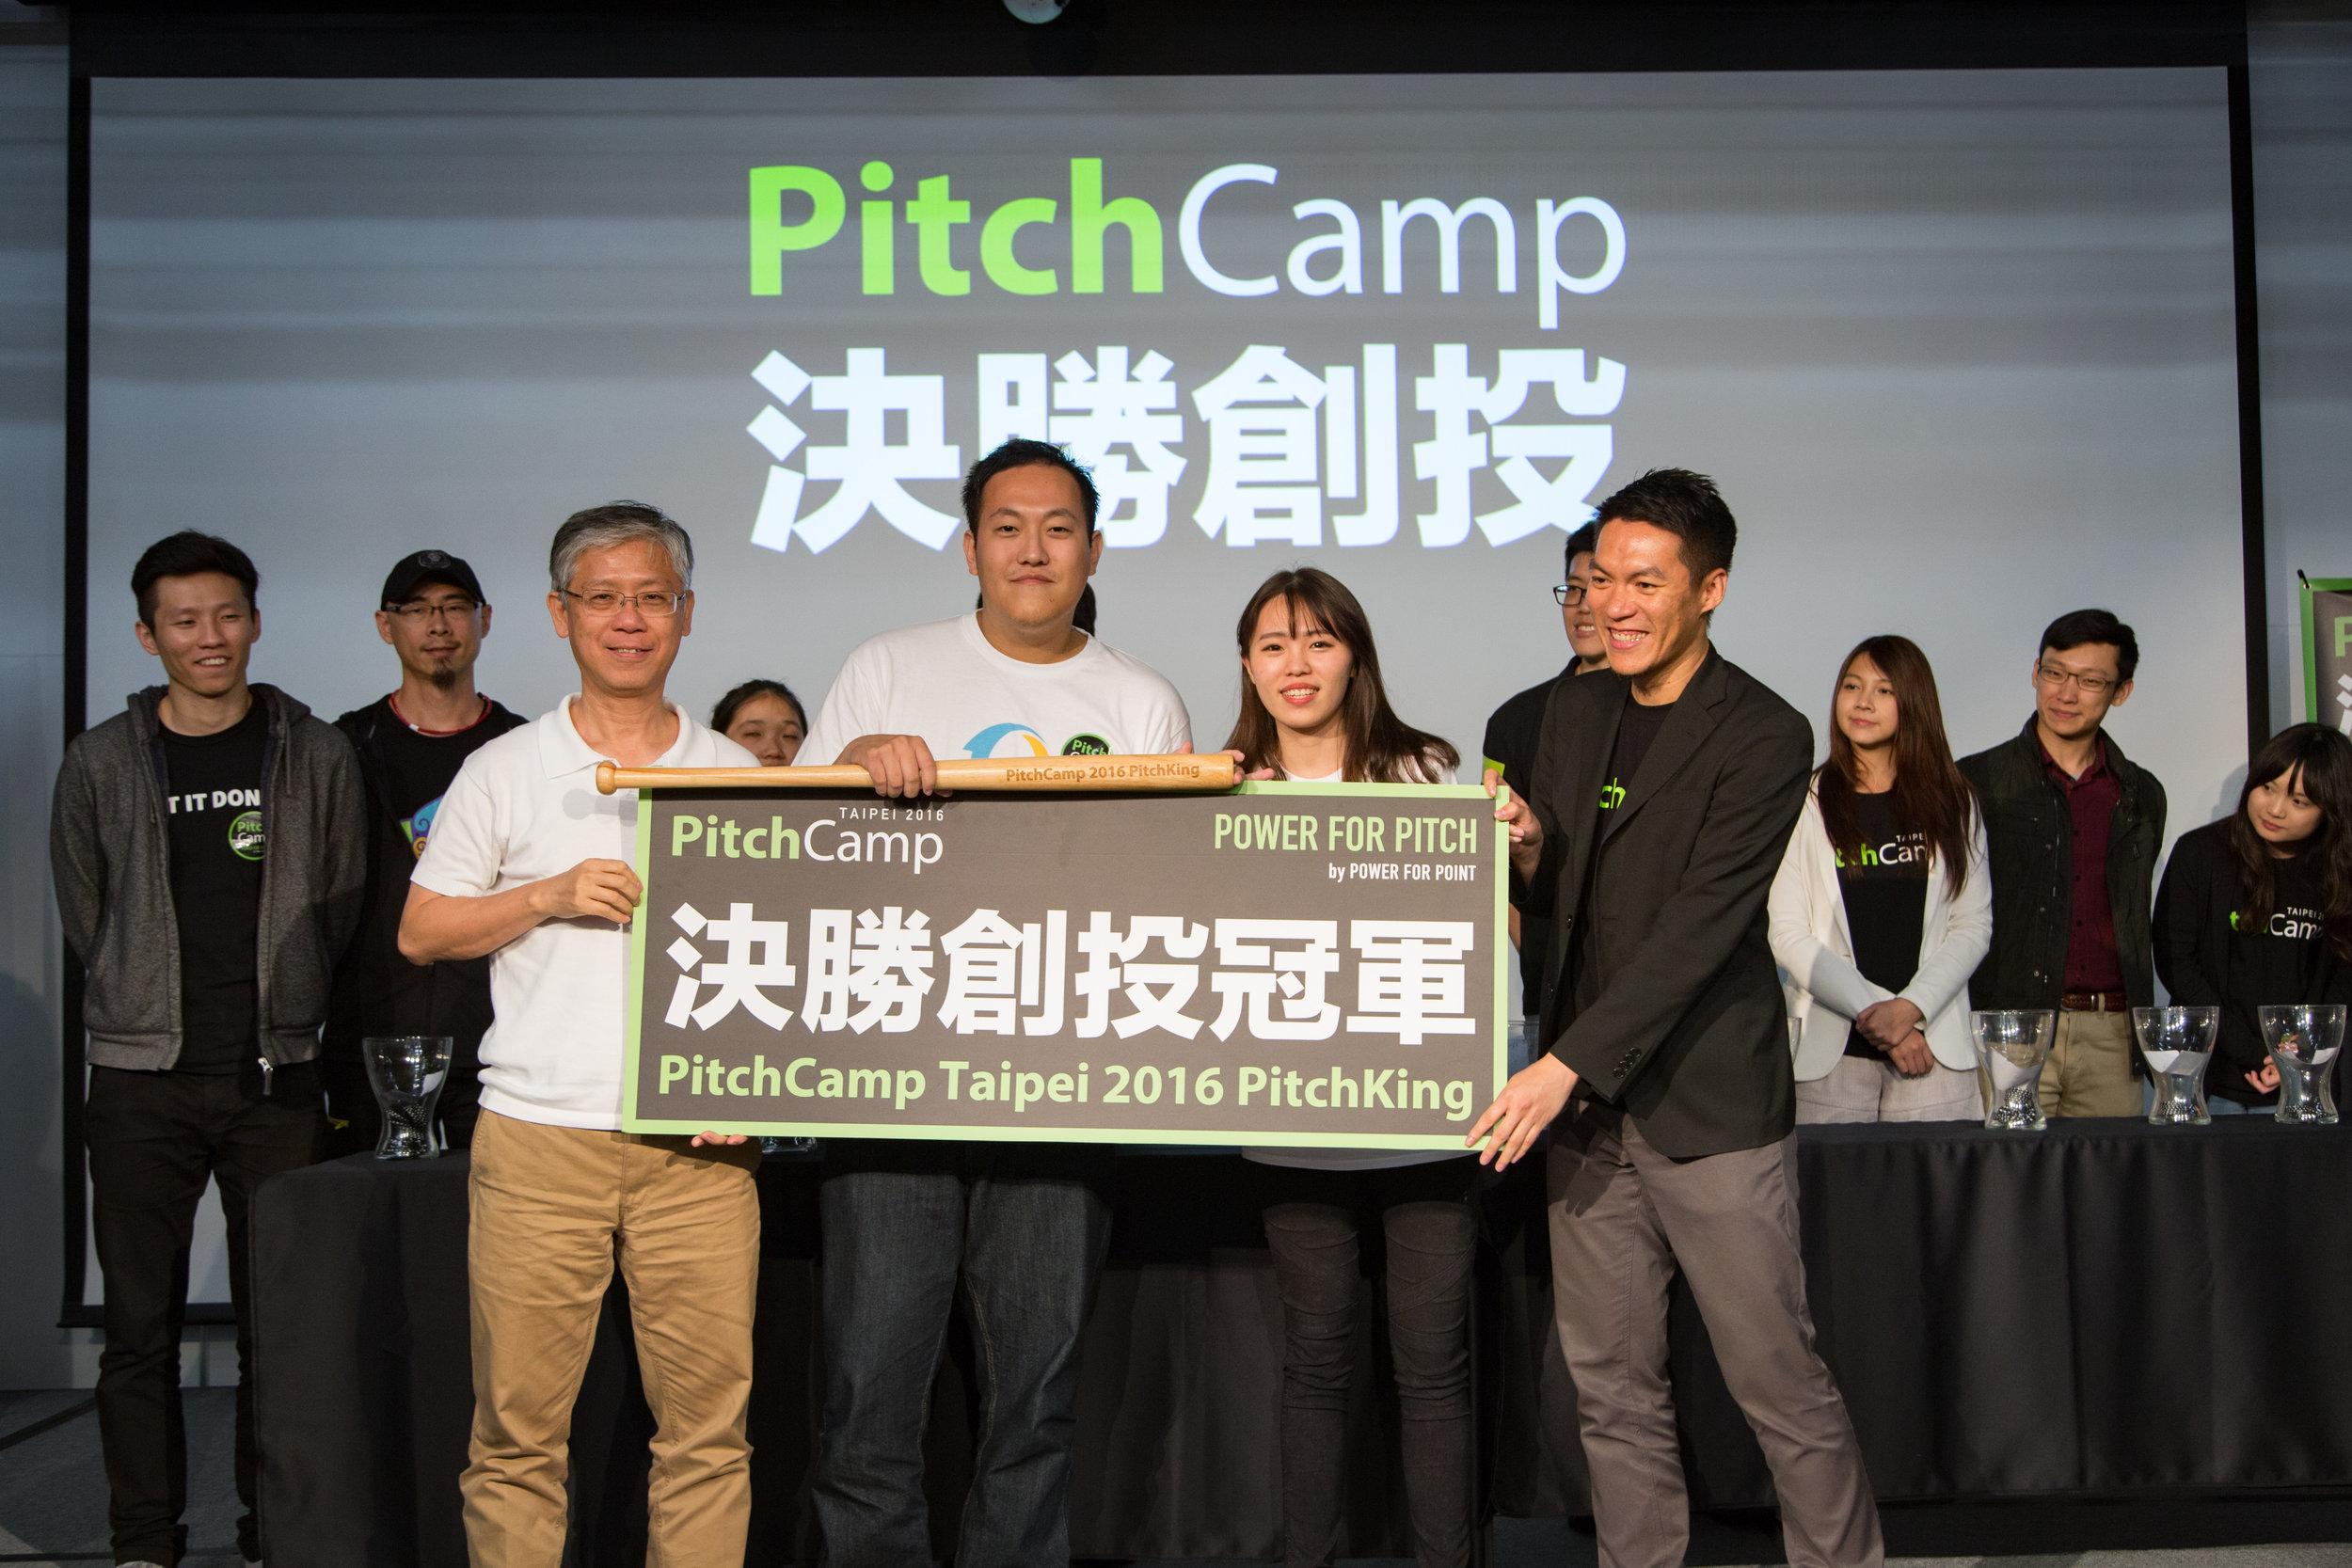 PitchCamp 2016